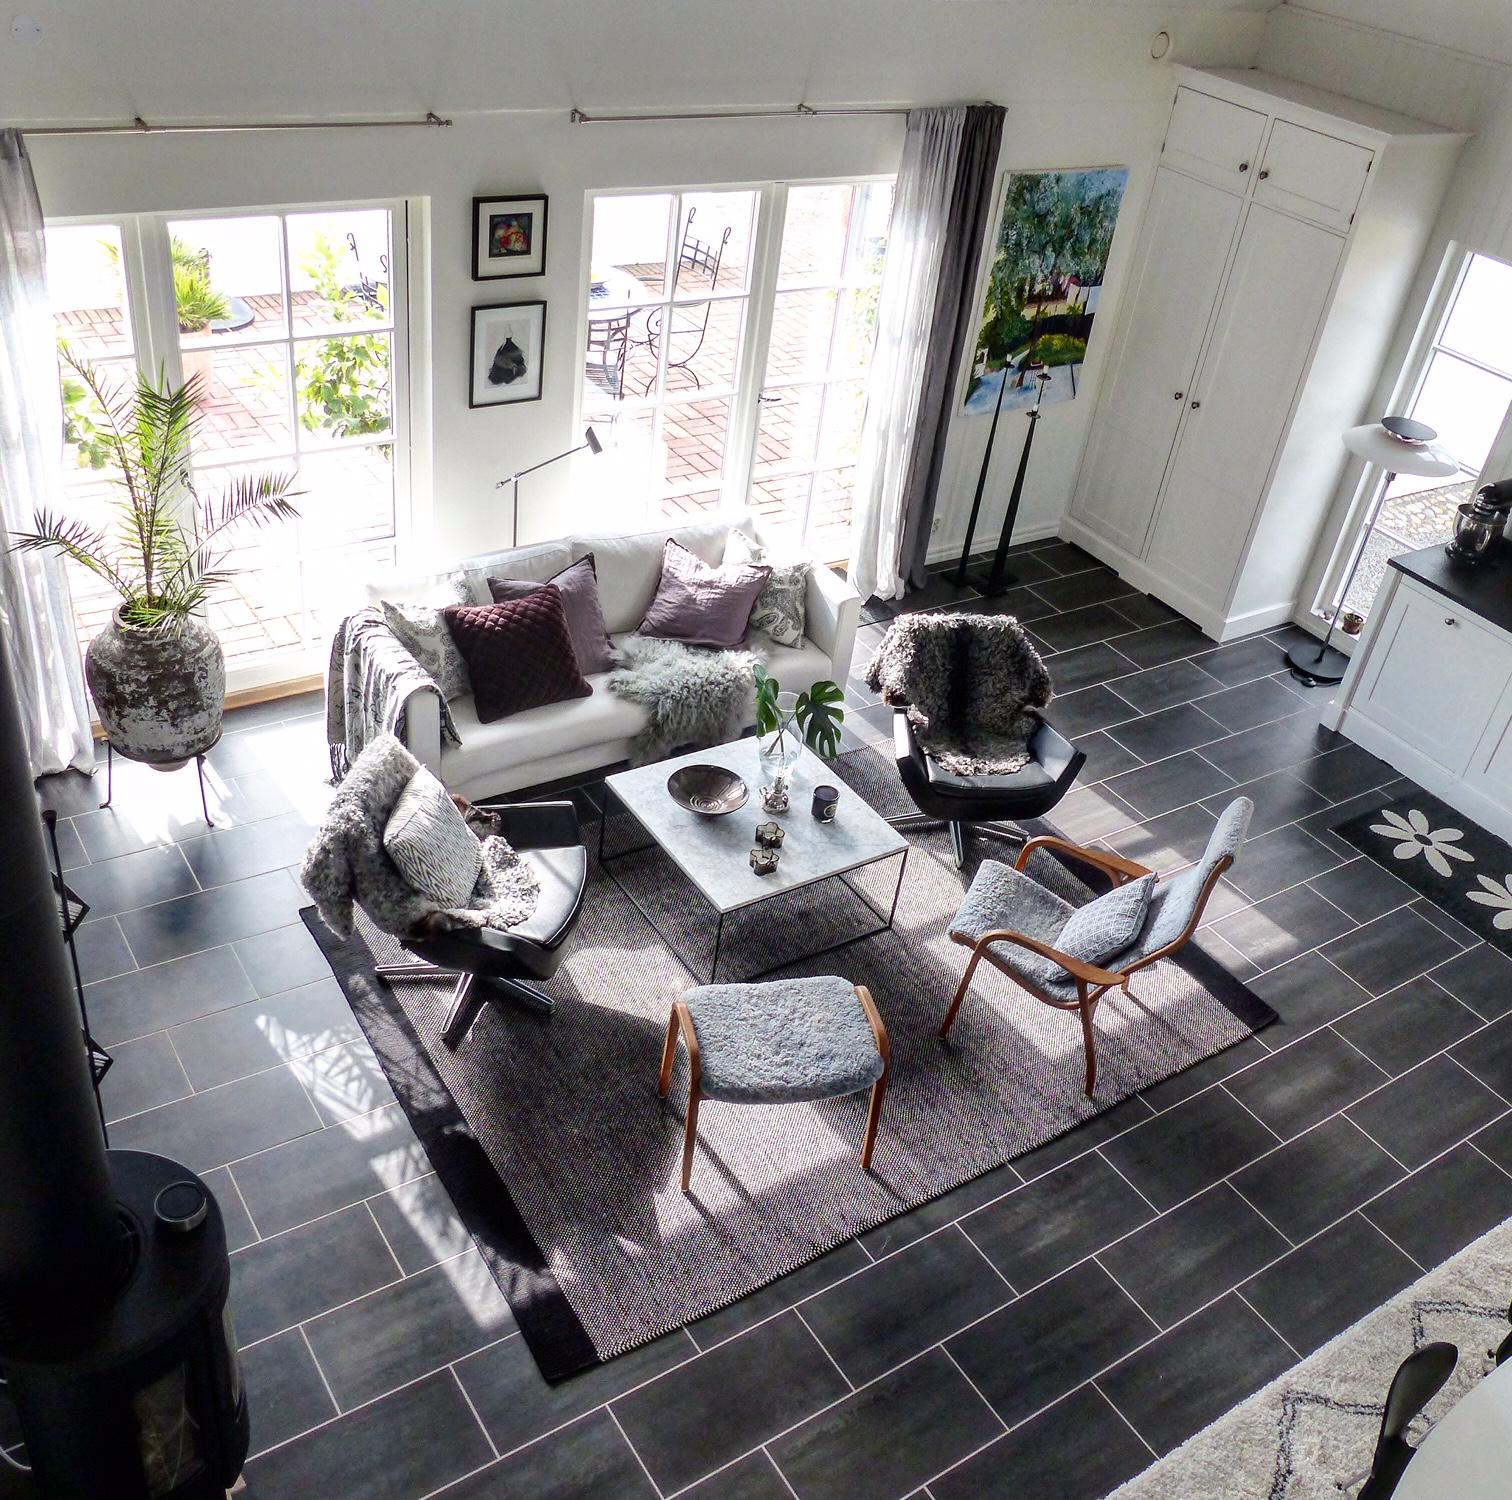 Casa Vik: Feng Shui i vardagsrummet